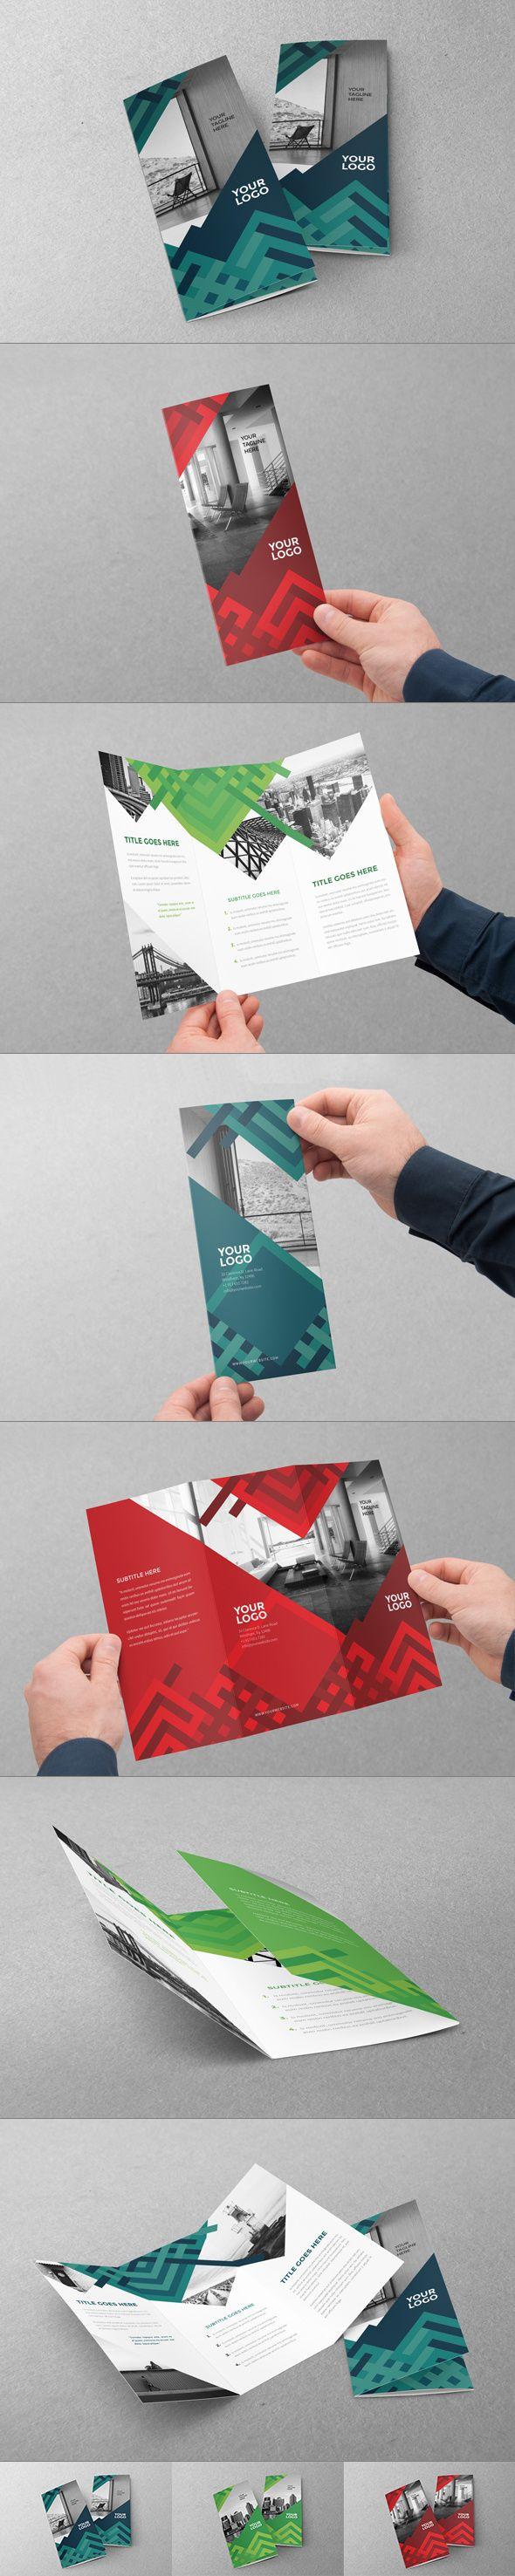 Colorful丰富多彩的三折页画册设计...